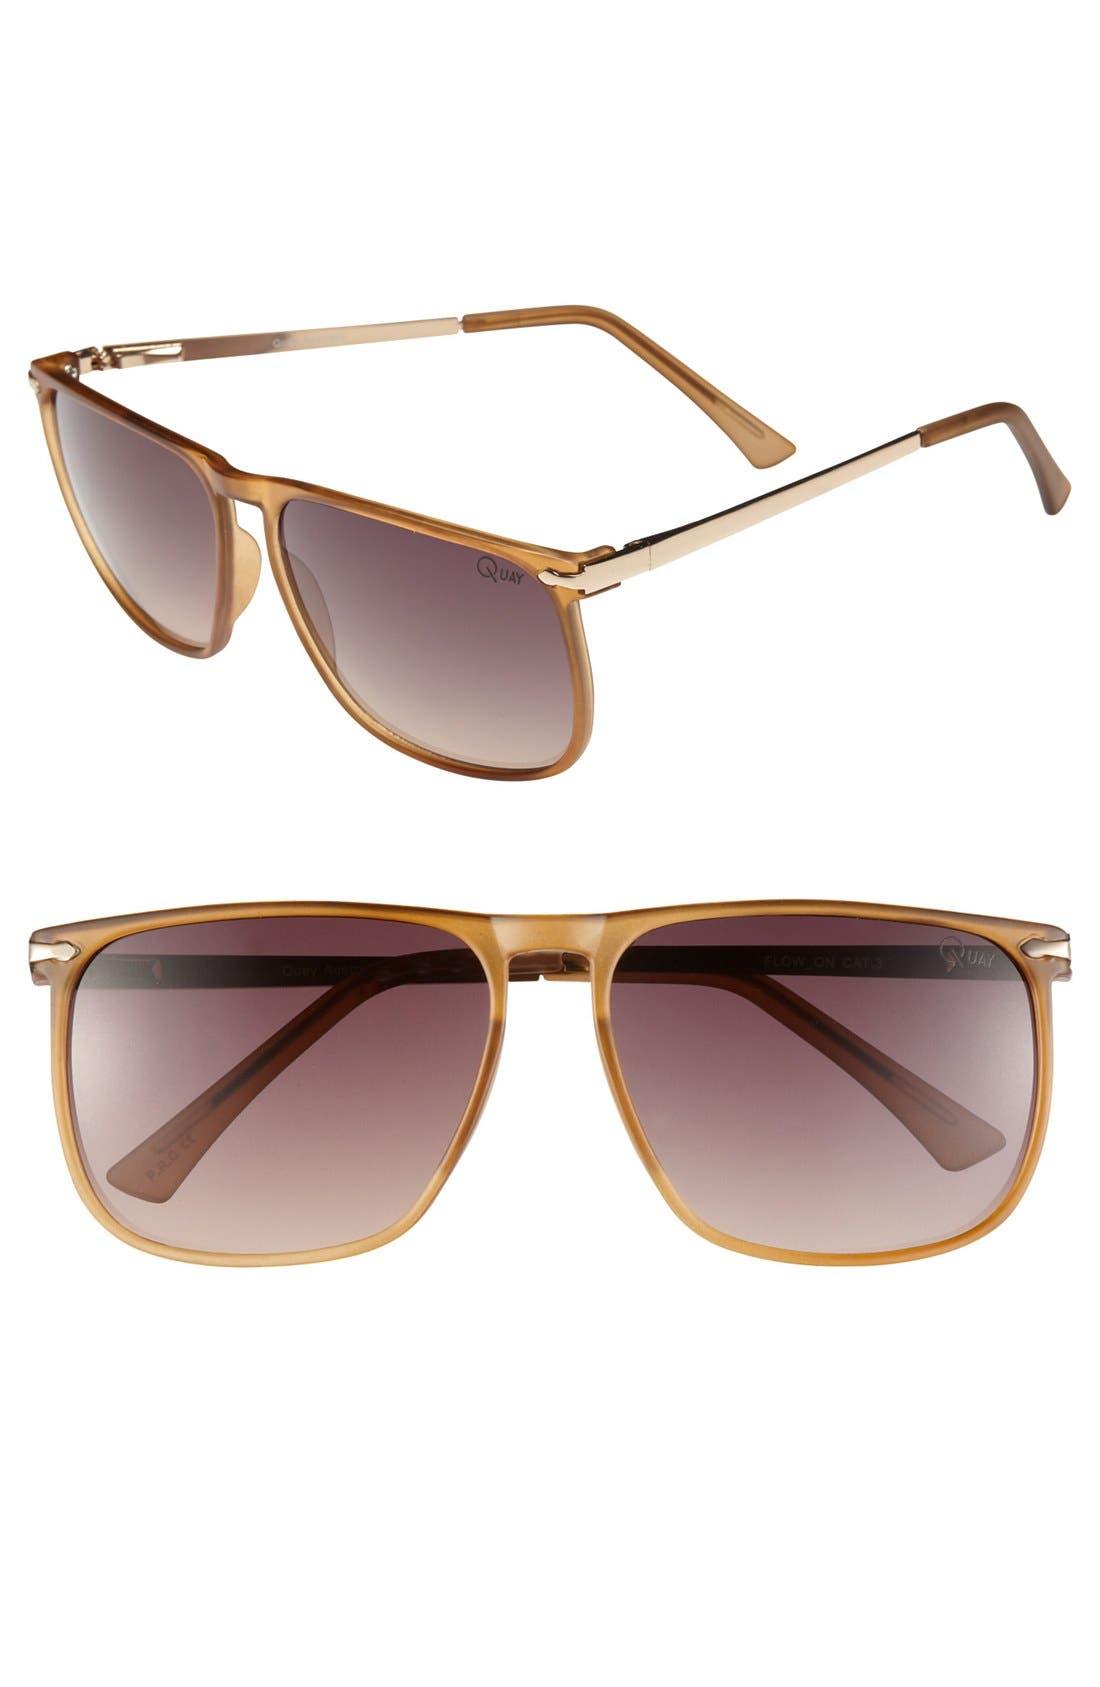 Main Image - Quay 'Follow On' Sunglasses